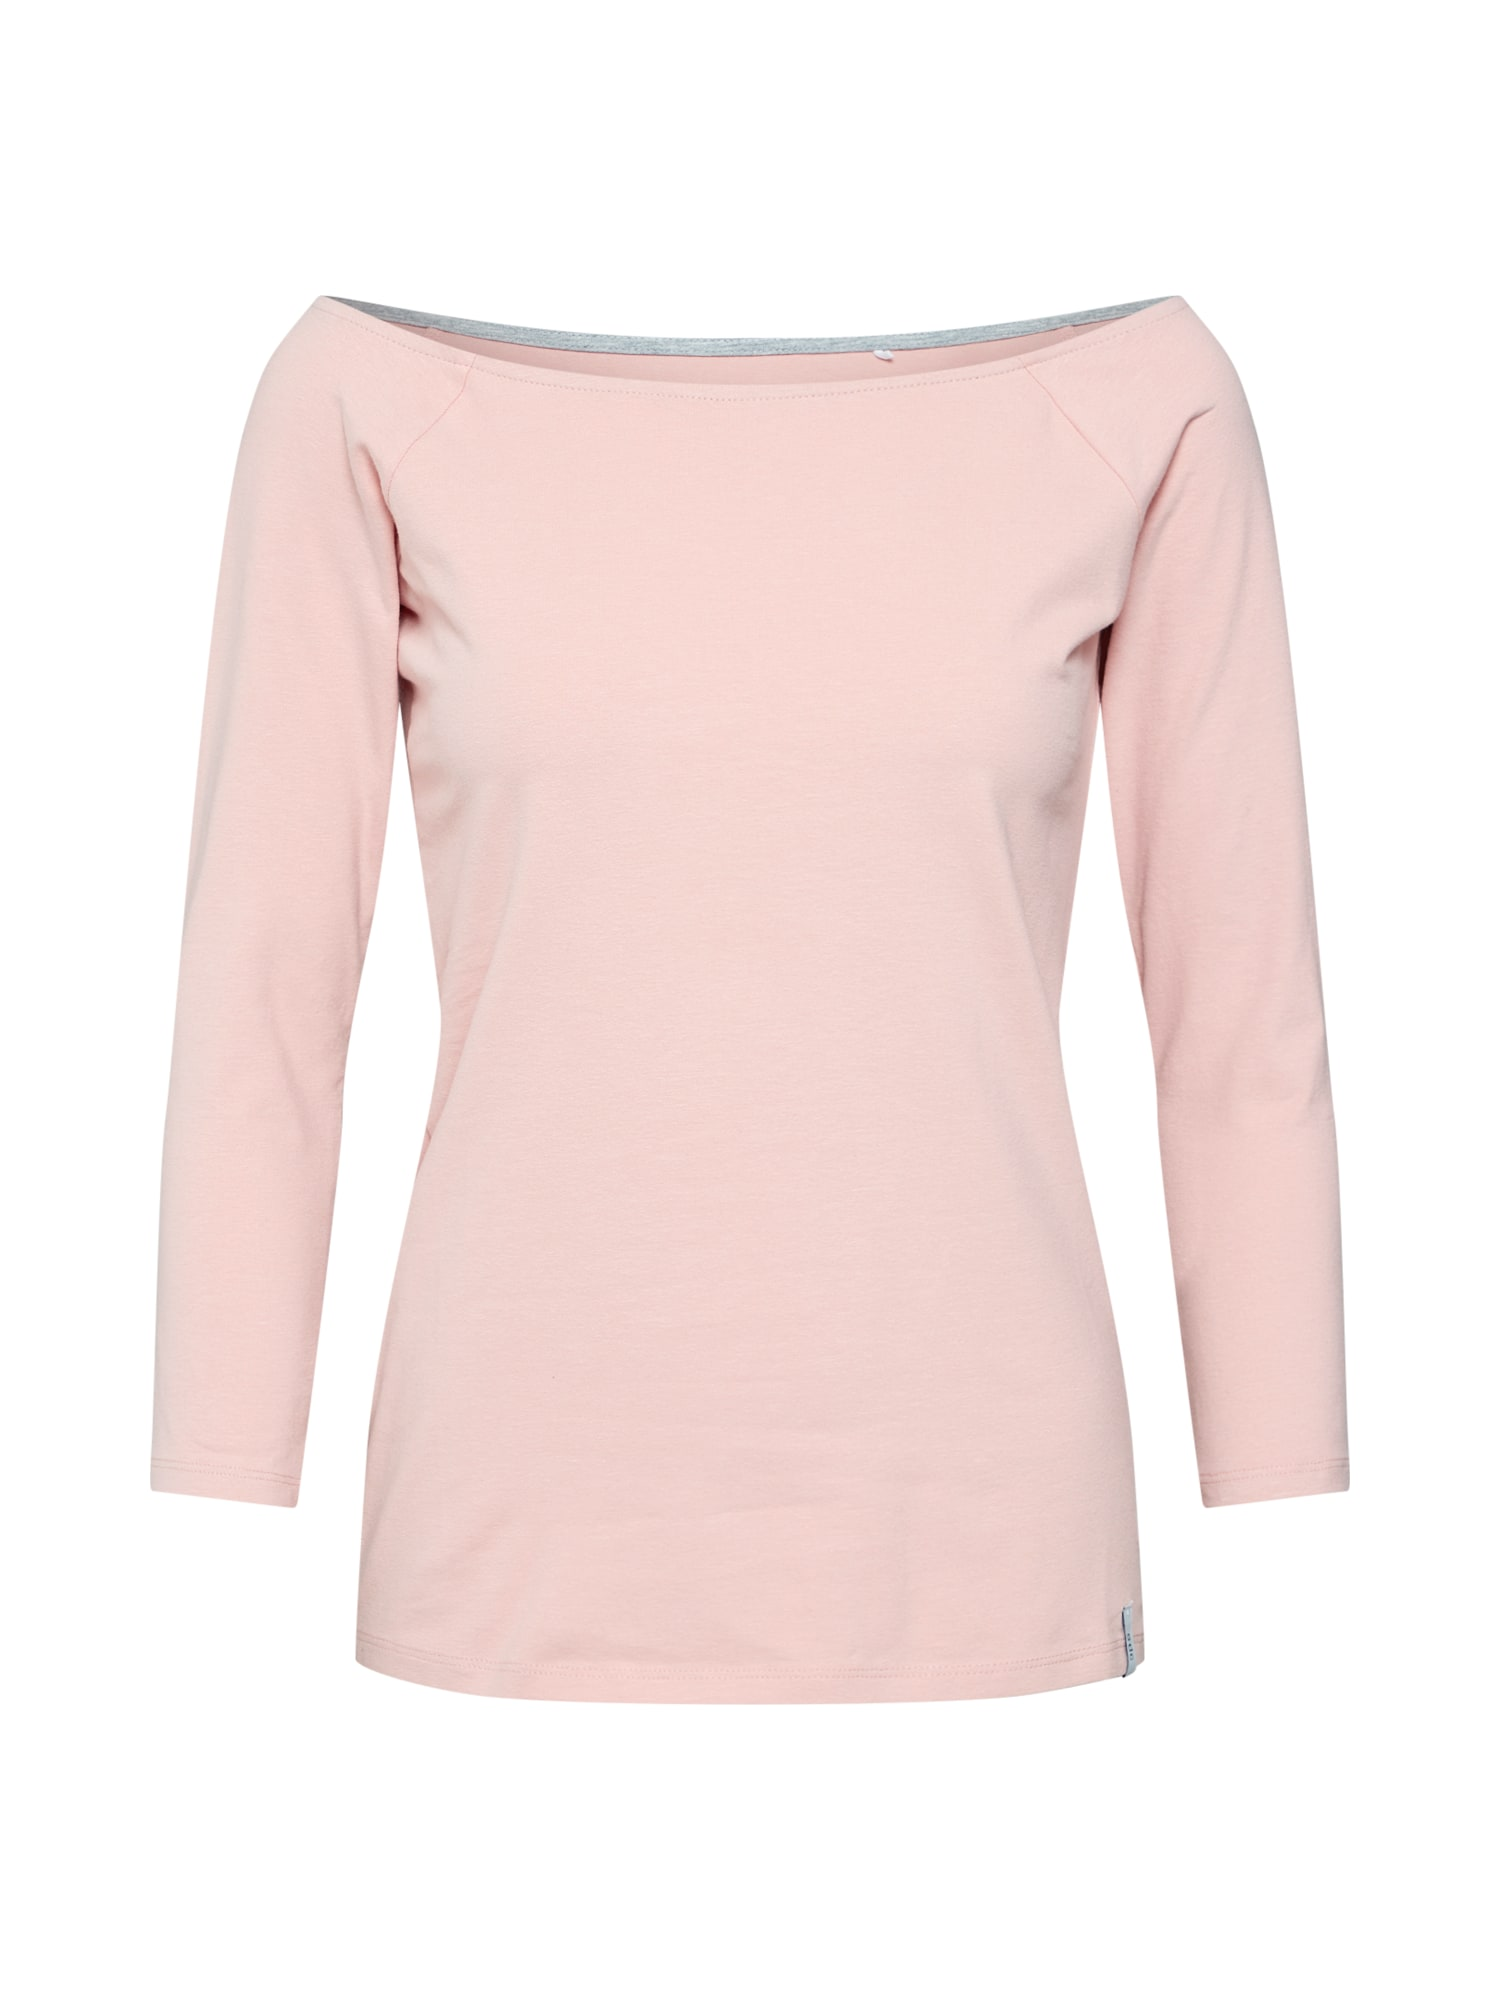 Tričko FLOW růže EDC BY ESPRIT